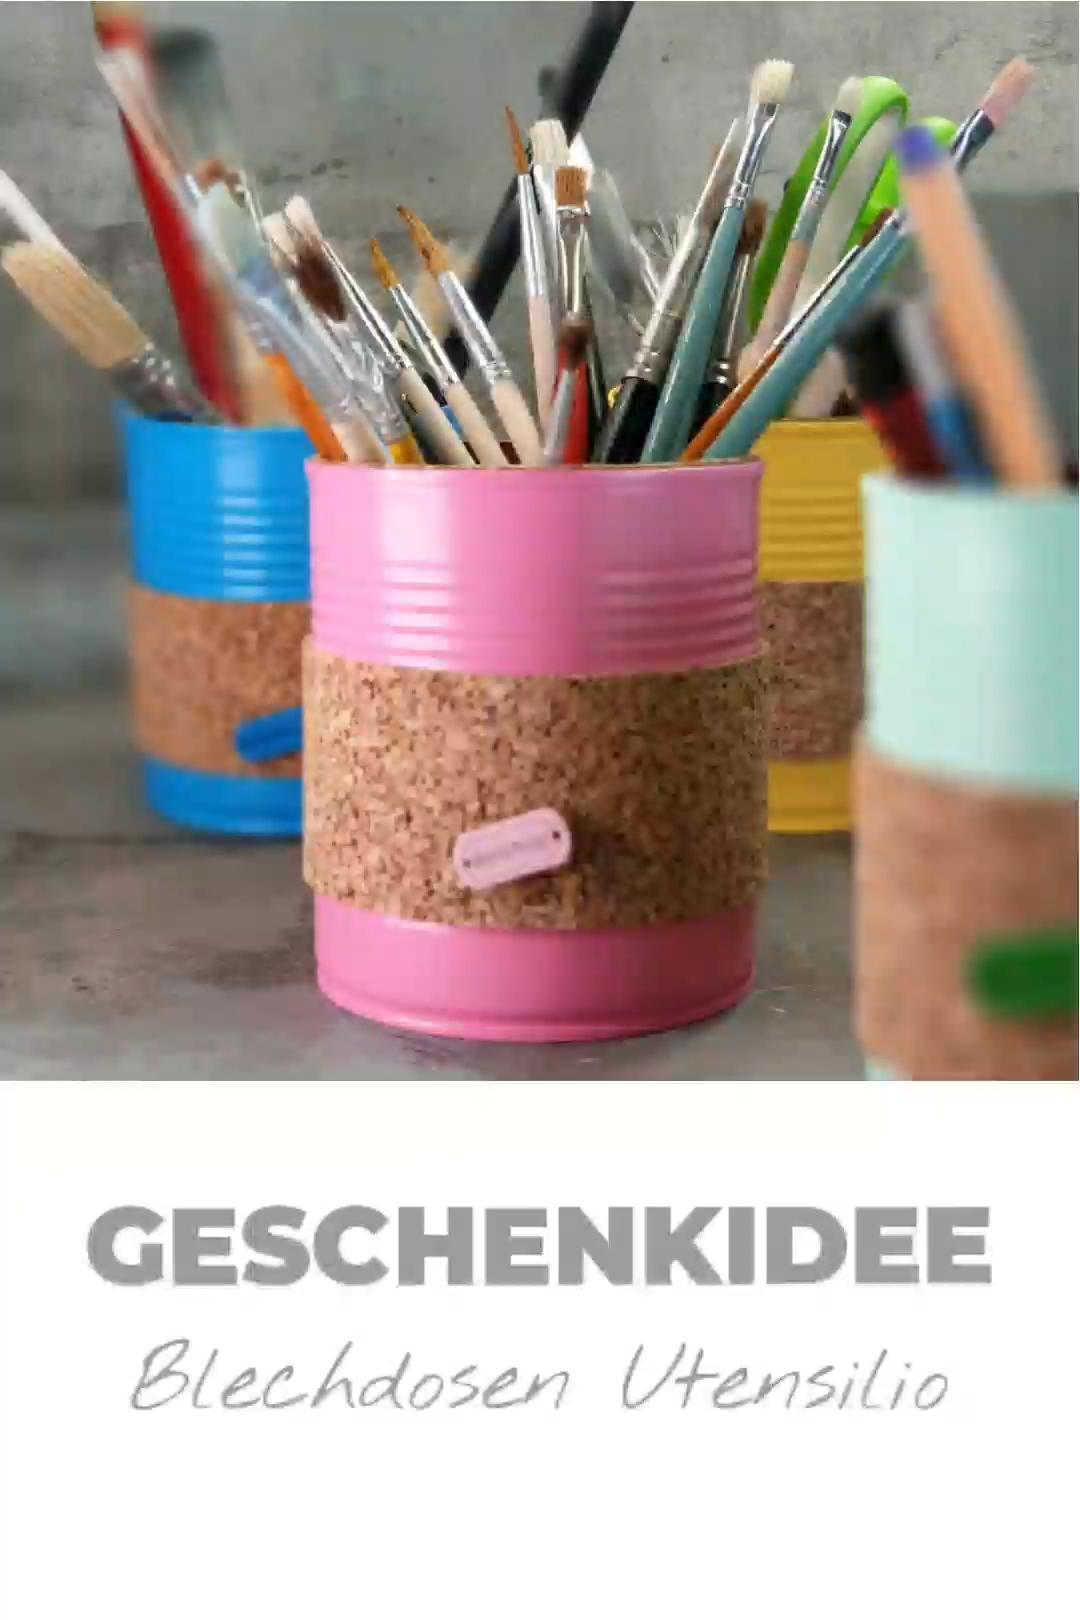 Photo of Geschenkidee DIY Blechdosen Utensilio